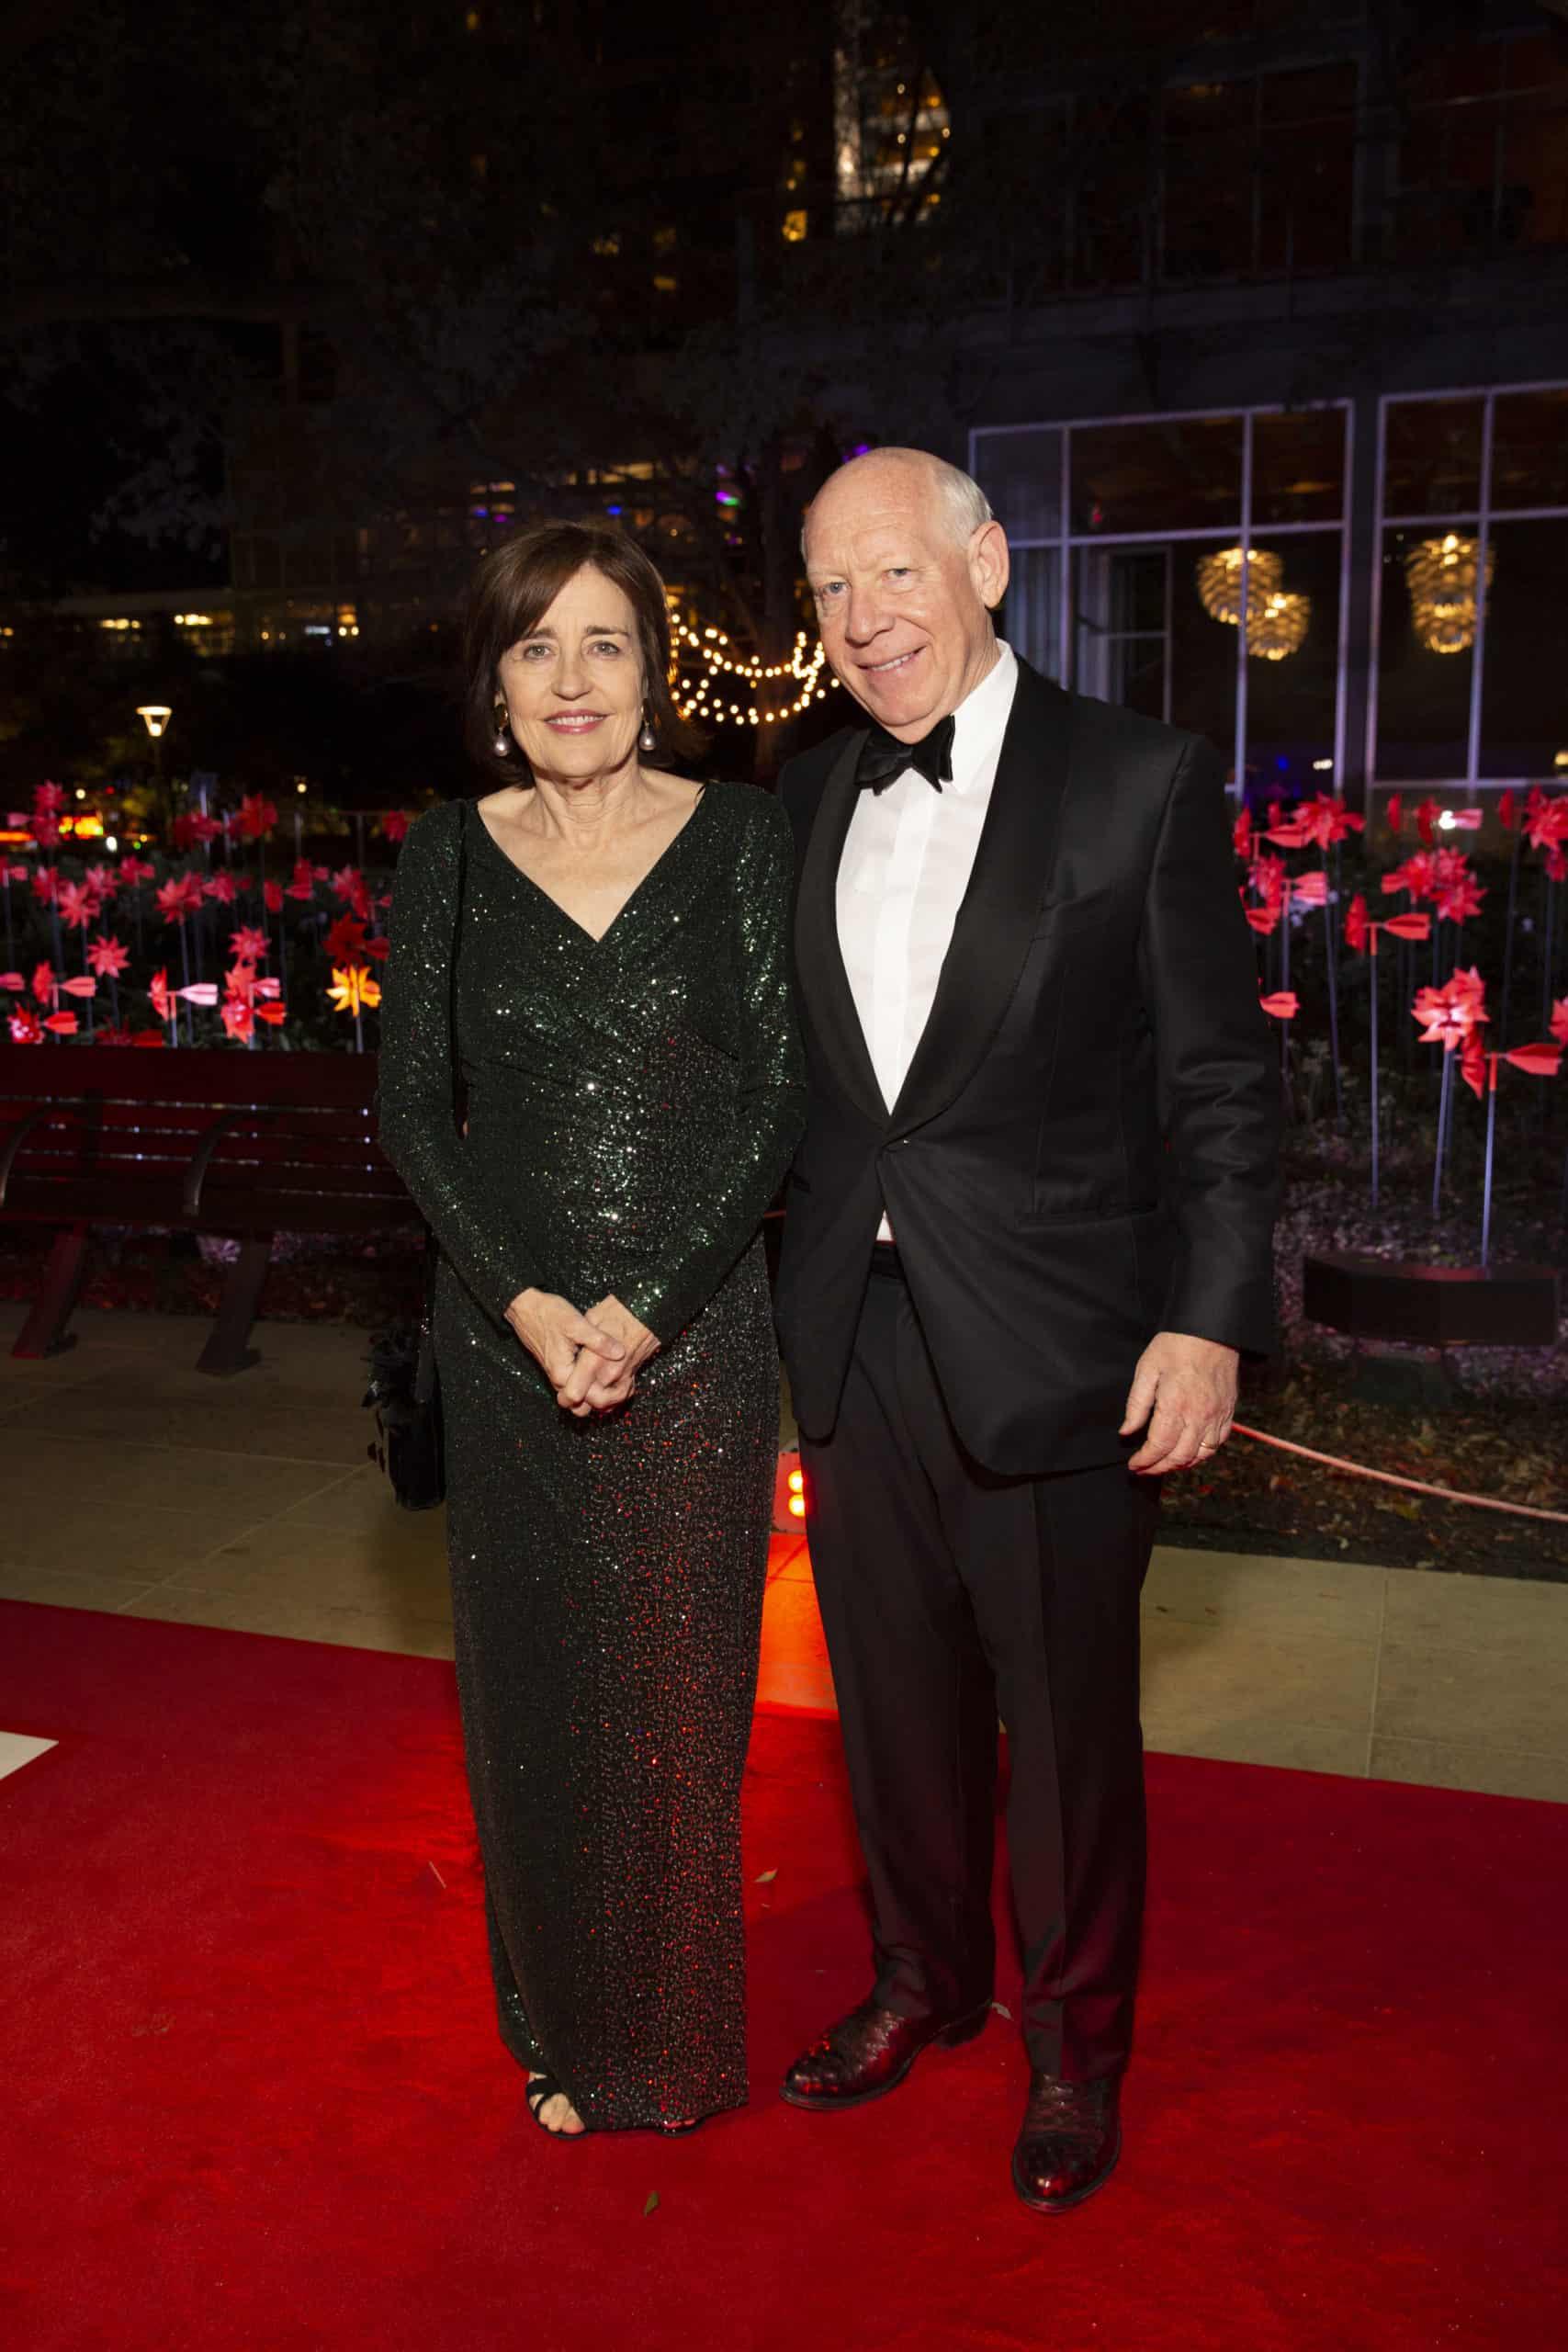 Andrea and Bill White